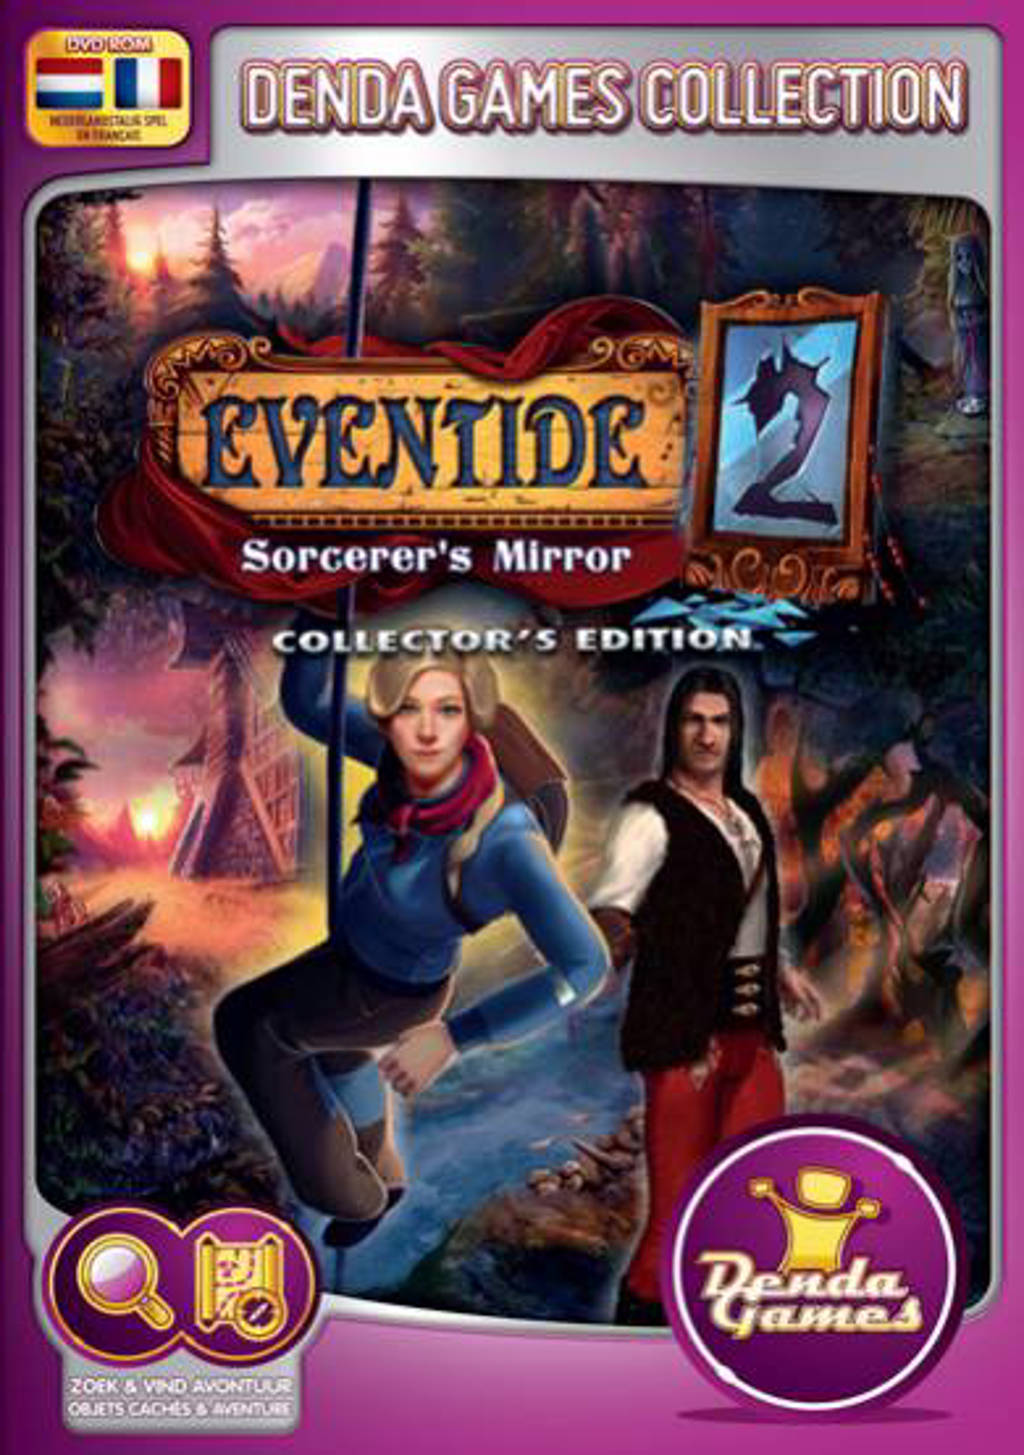 Eventide 2 - Sorcerer's mirror (Collectors edition) (PC)